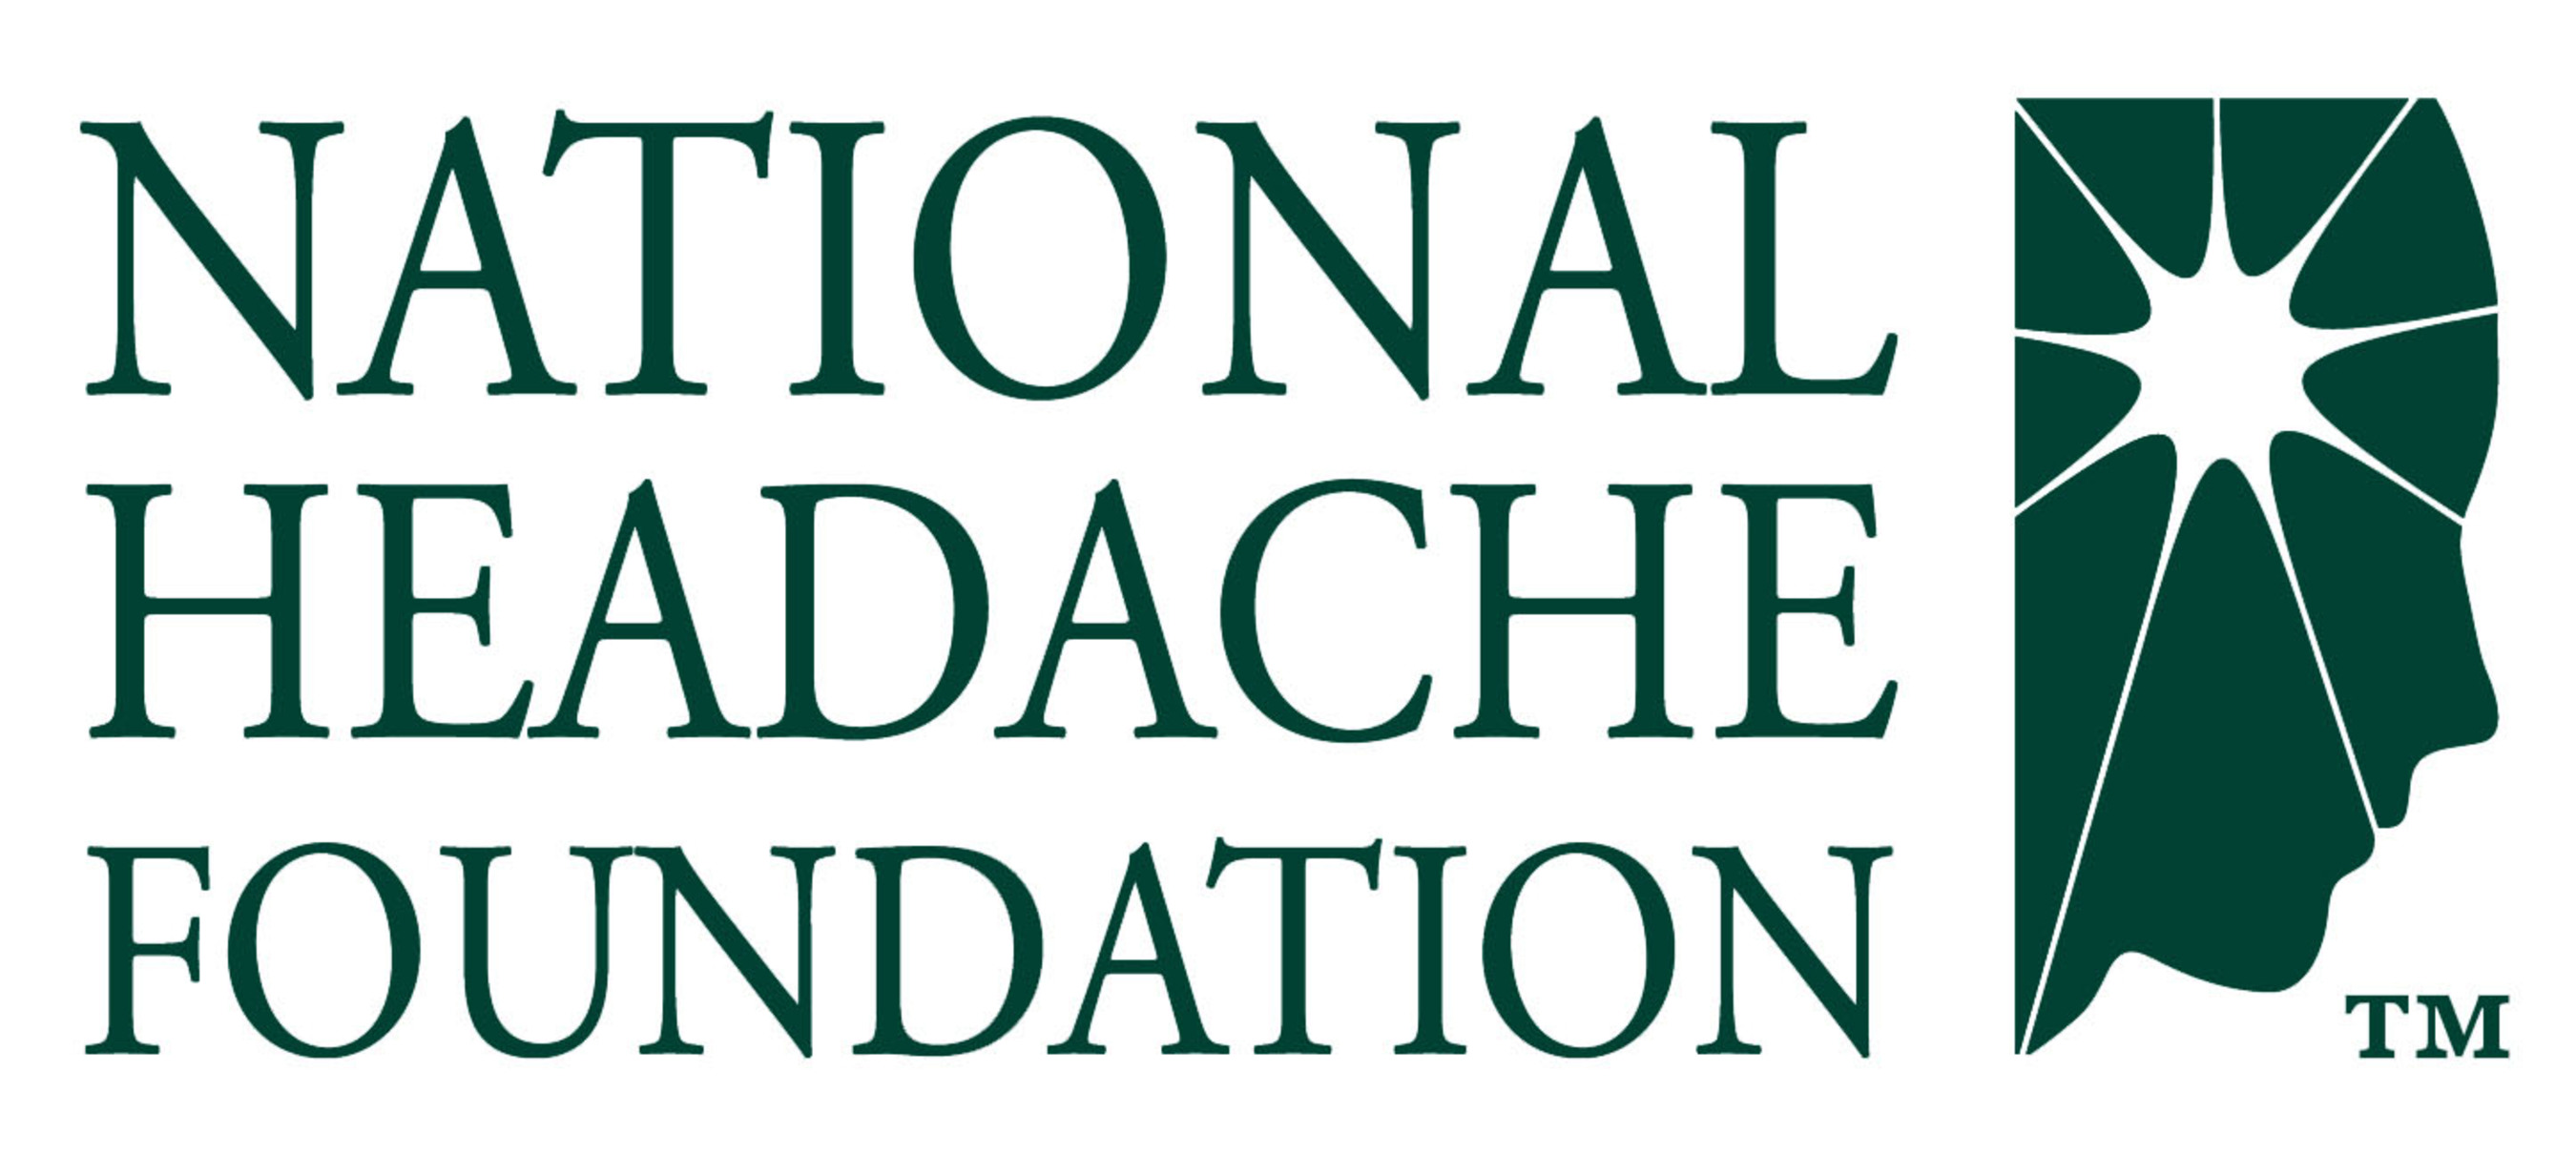 National Headache Foundation logo.